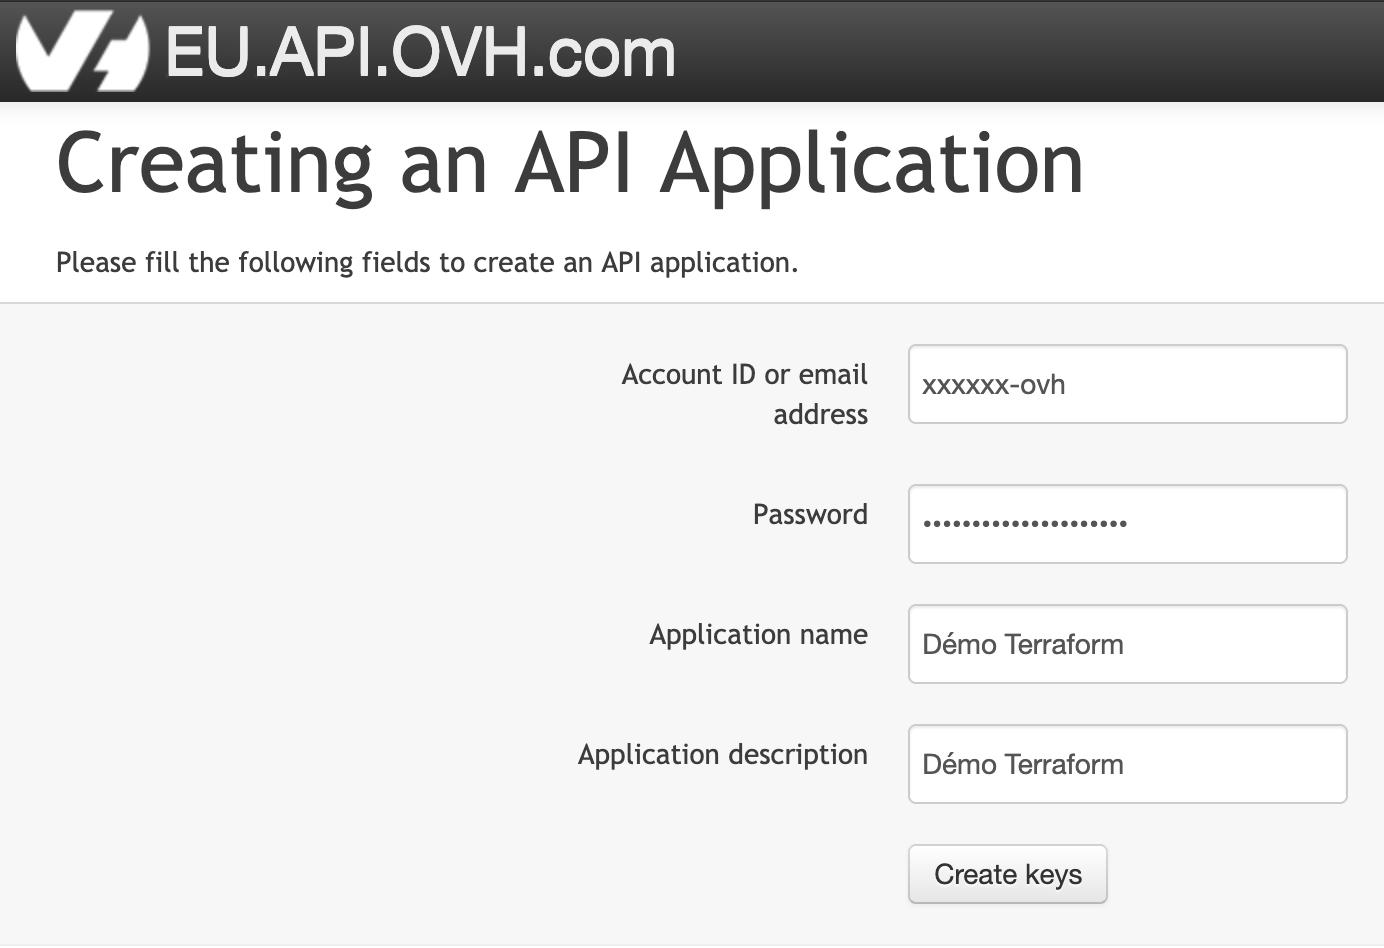 Création de clée d'API OVH/1